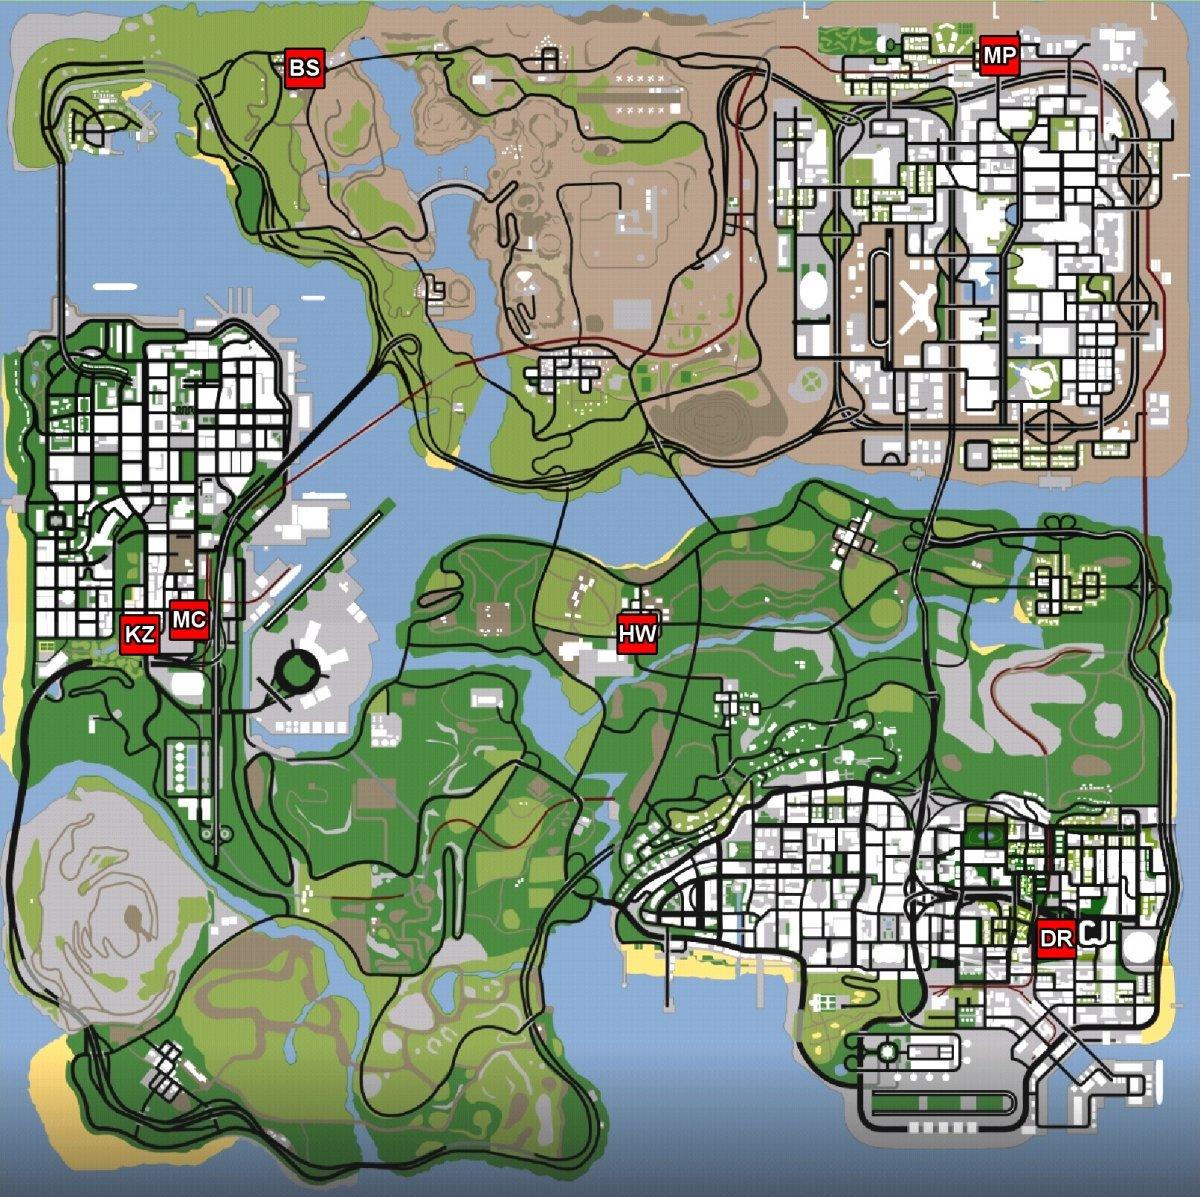 Locations of girlfriends in GTA San Andreas